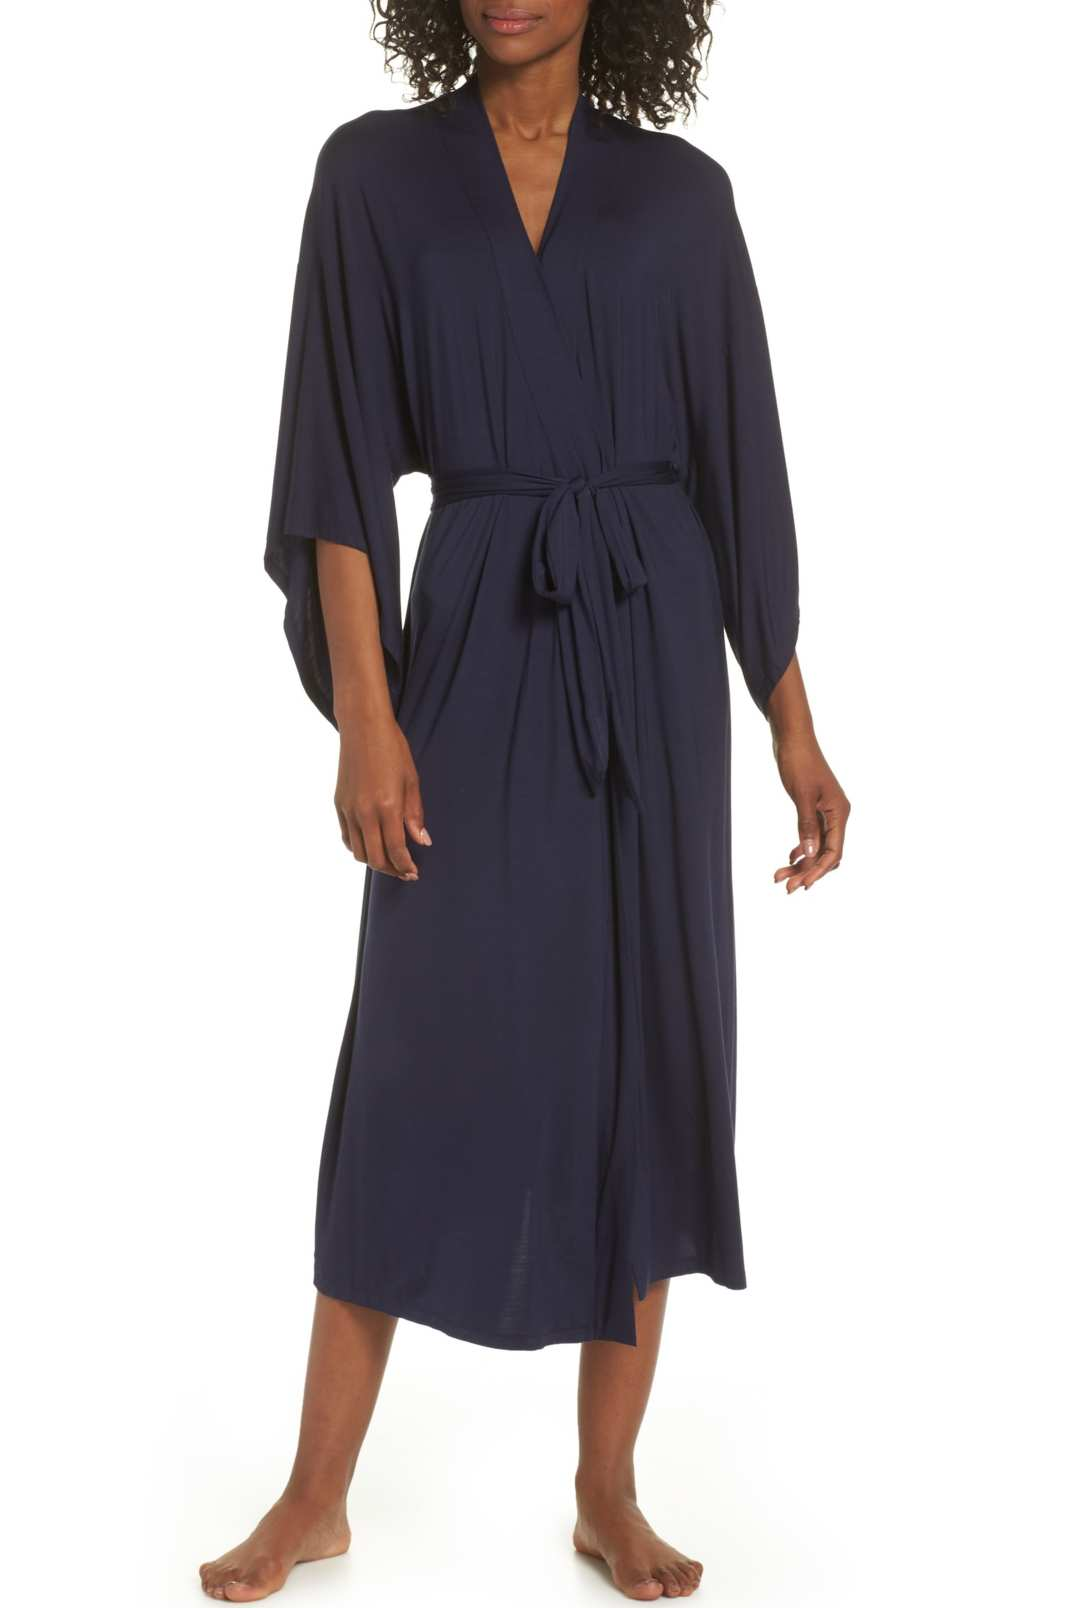 Eberjey Colette Kimono Sleeve Long Robe